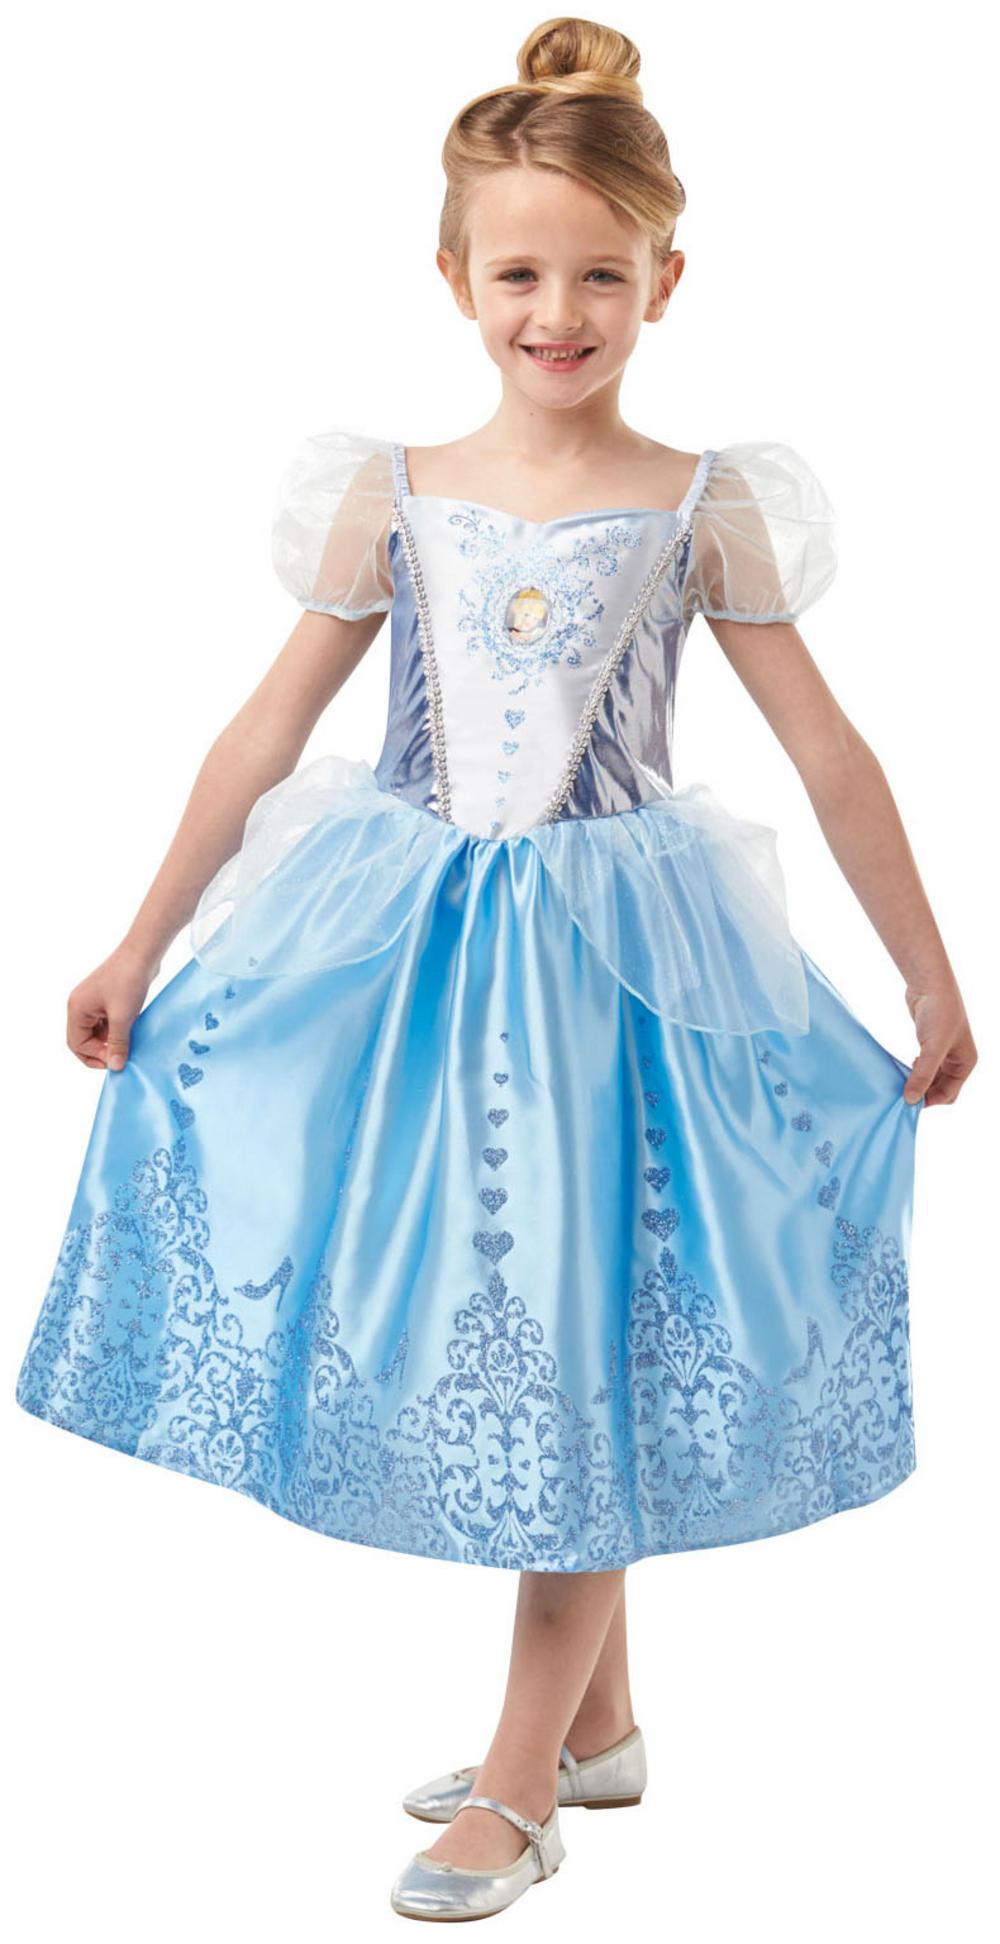 Gem Princess Cinderella Girls Costume